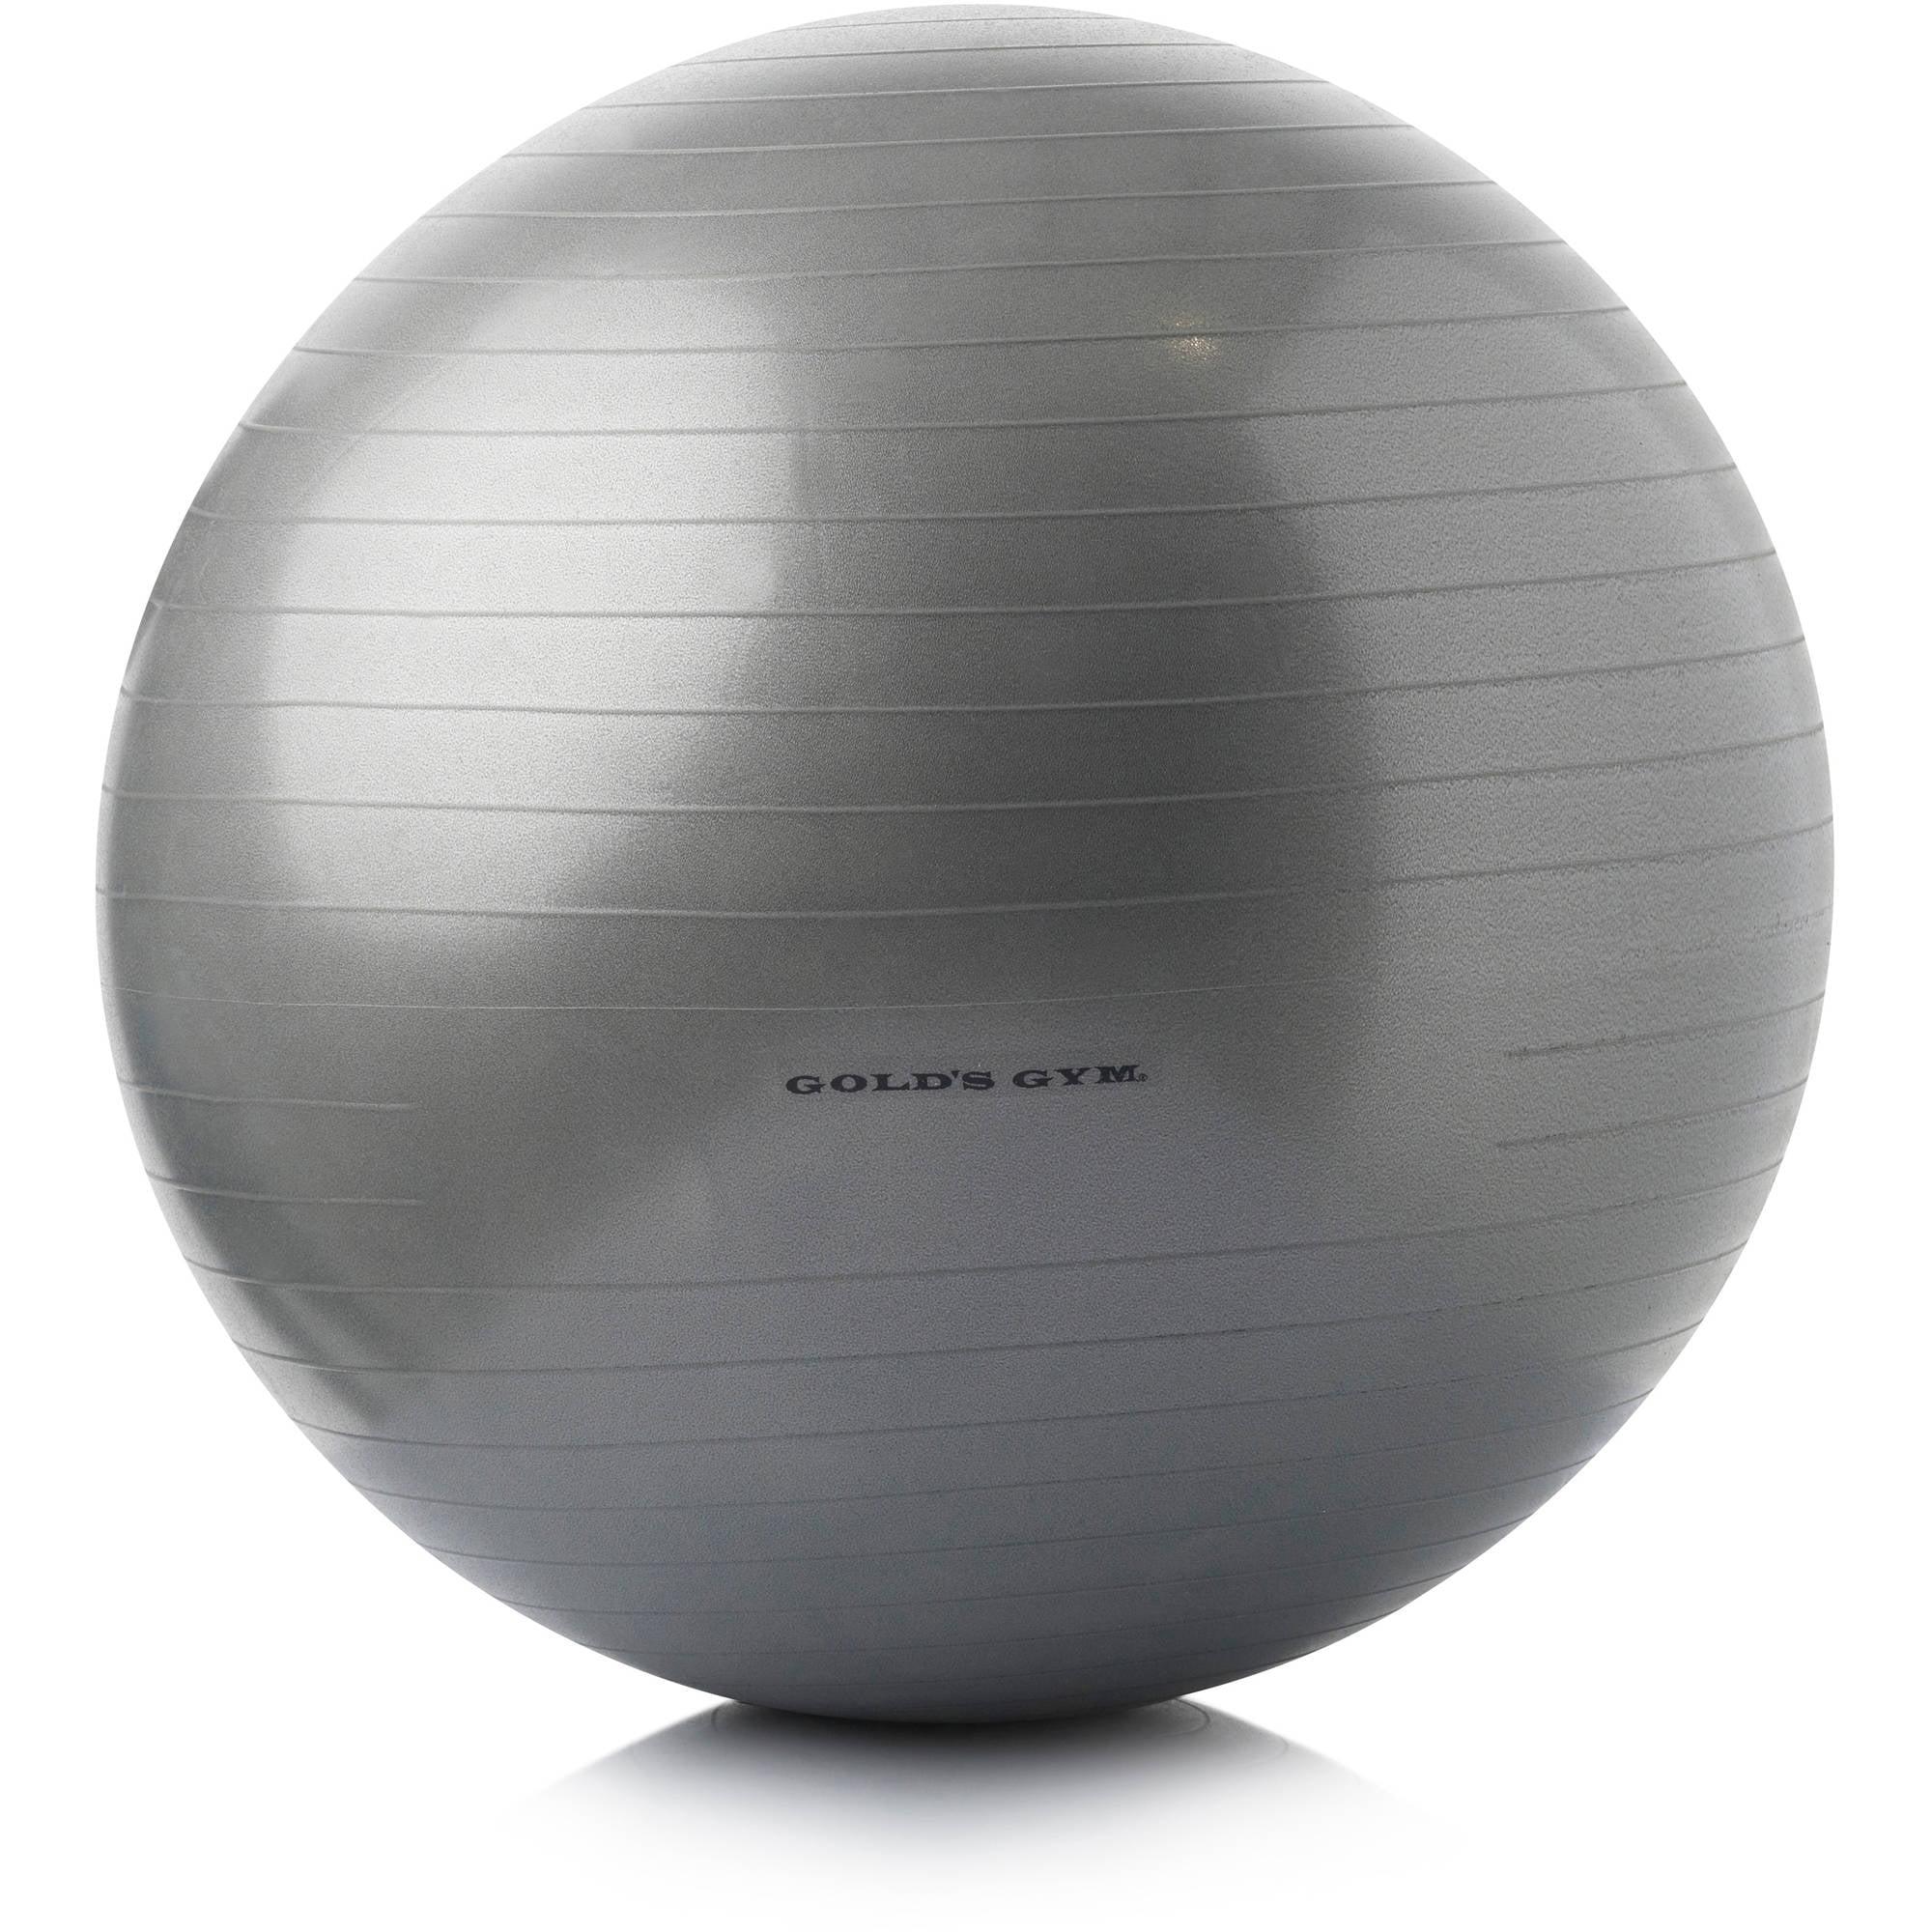 Gold's Gym 75cm Anti-Burst Body Ball